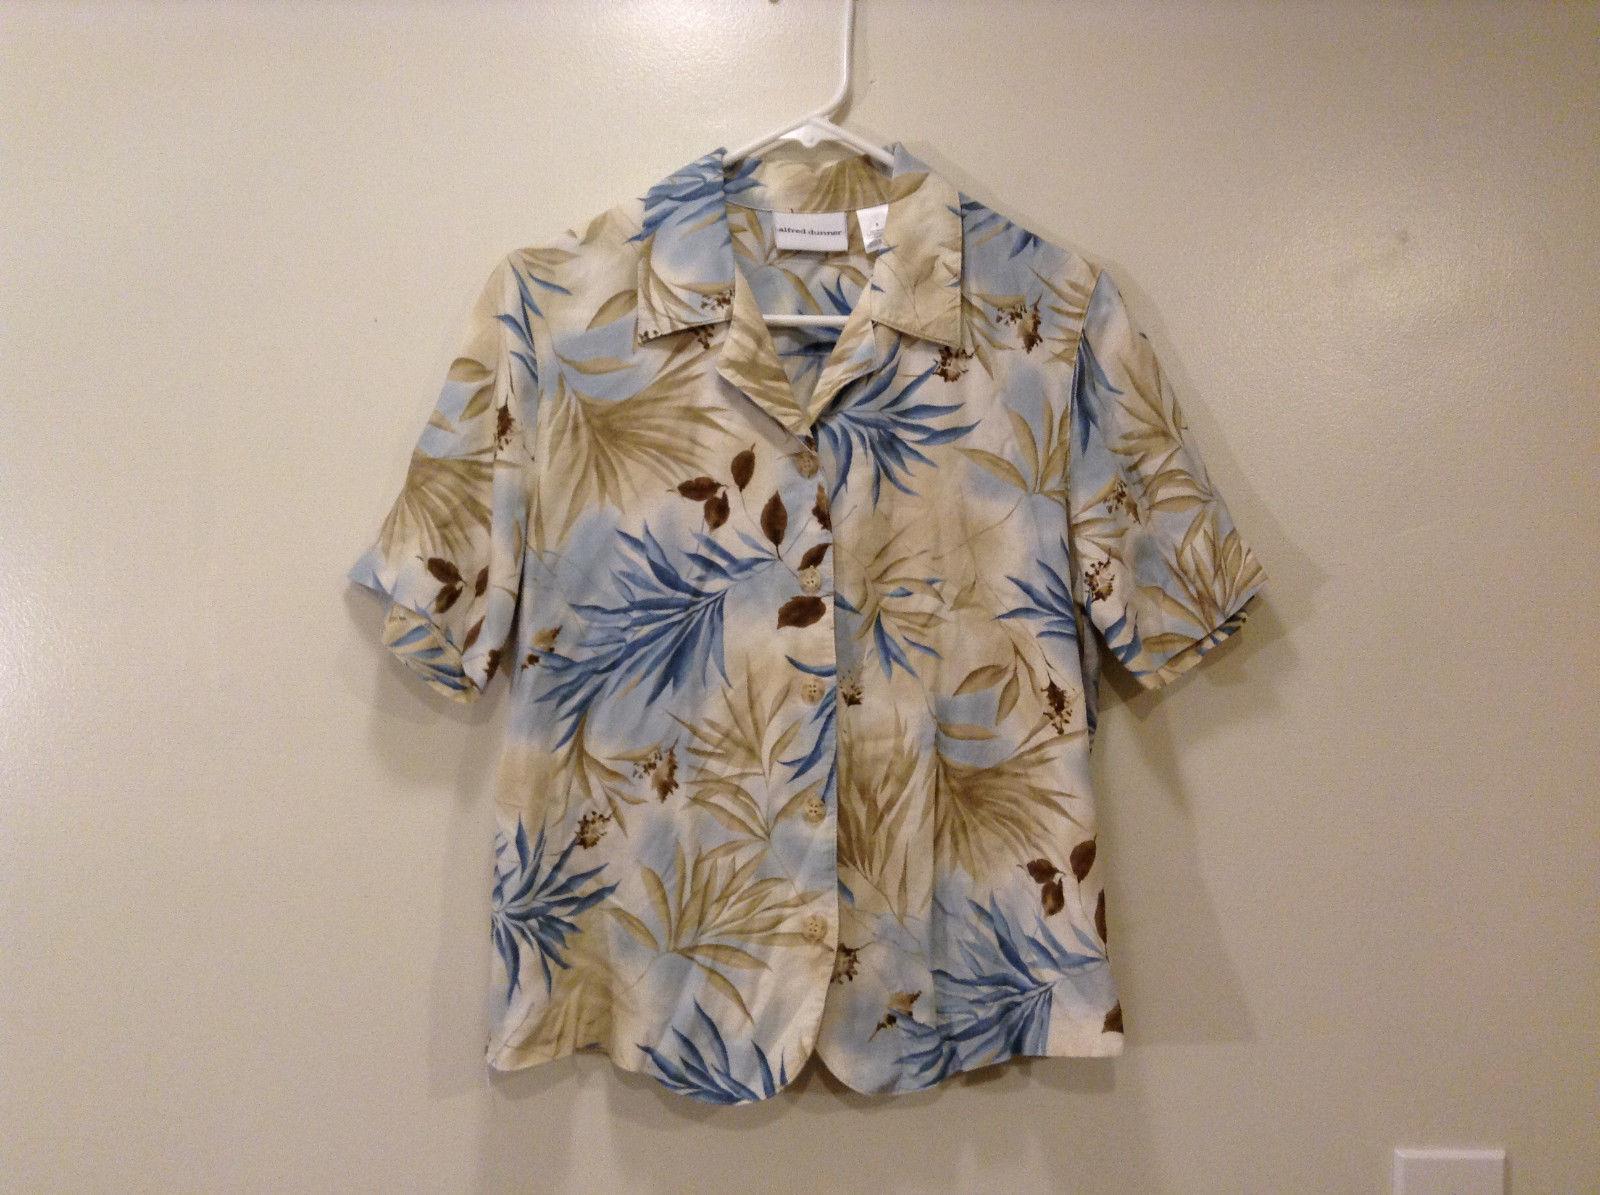 Alfred Dunner Ladies Lt. Blue/Lt. Brown Exotic Leaves Blouse, Size 8